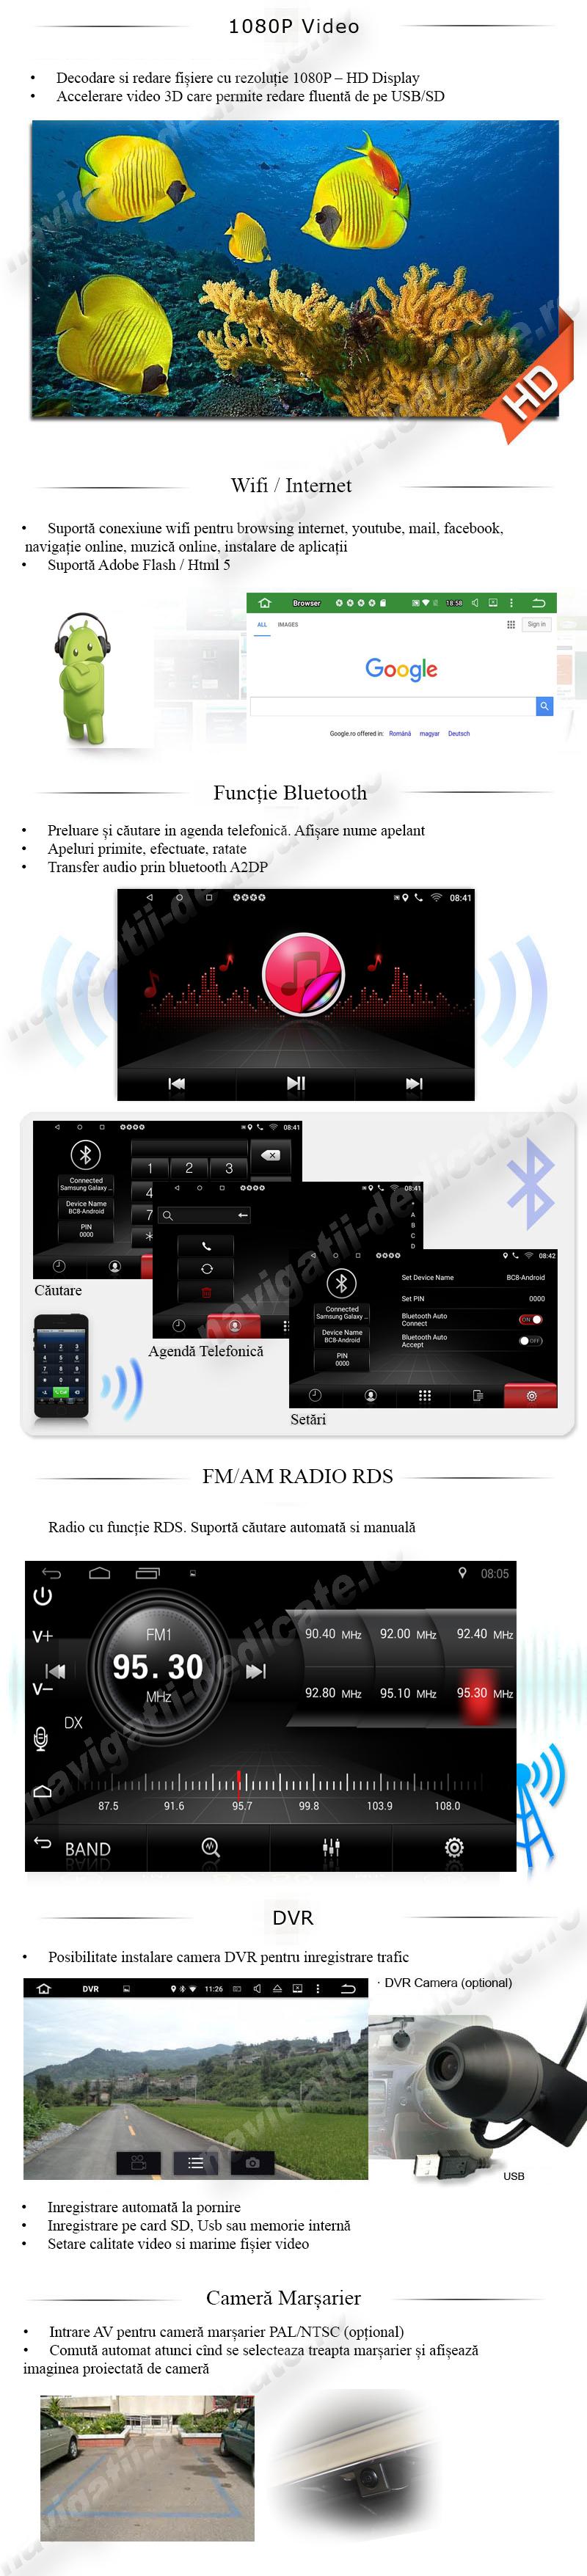 allwinner t3 radio